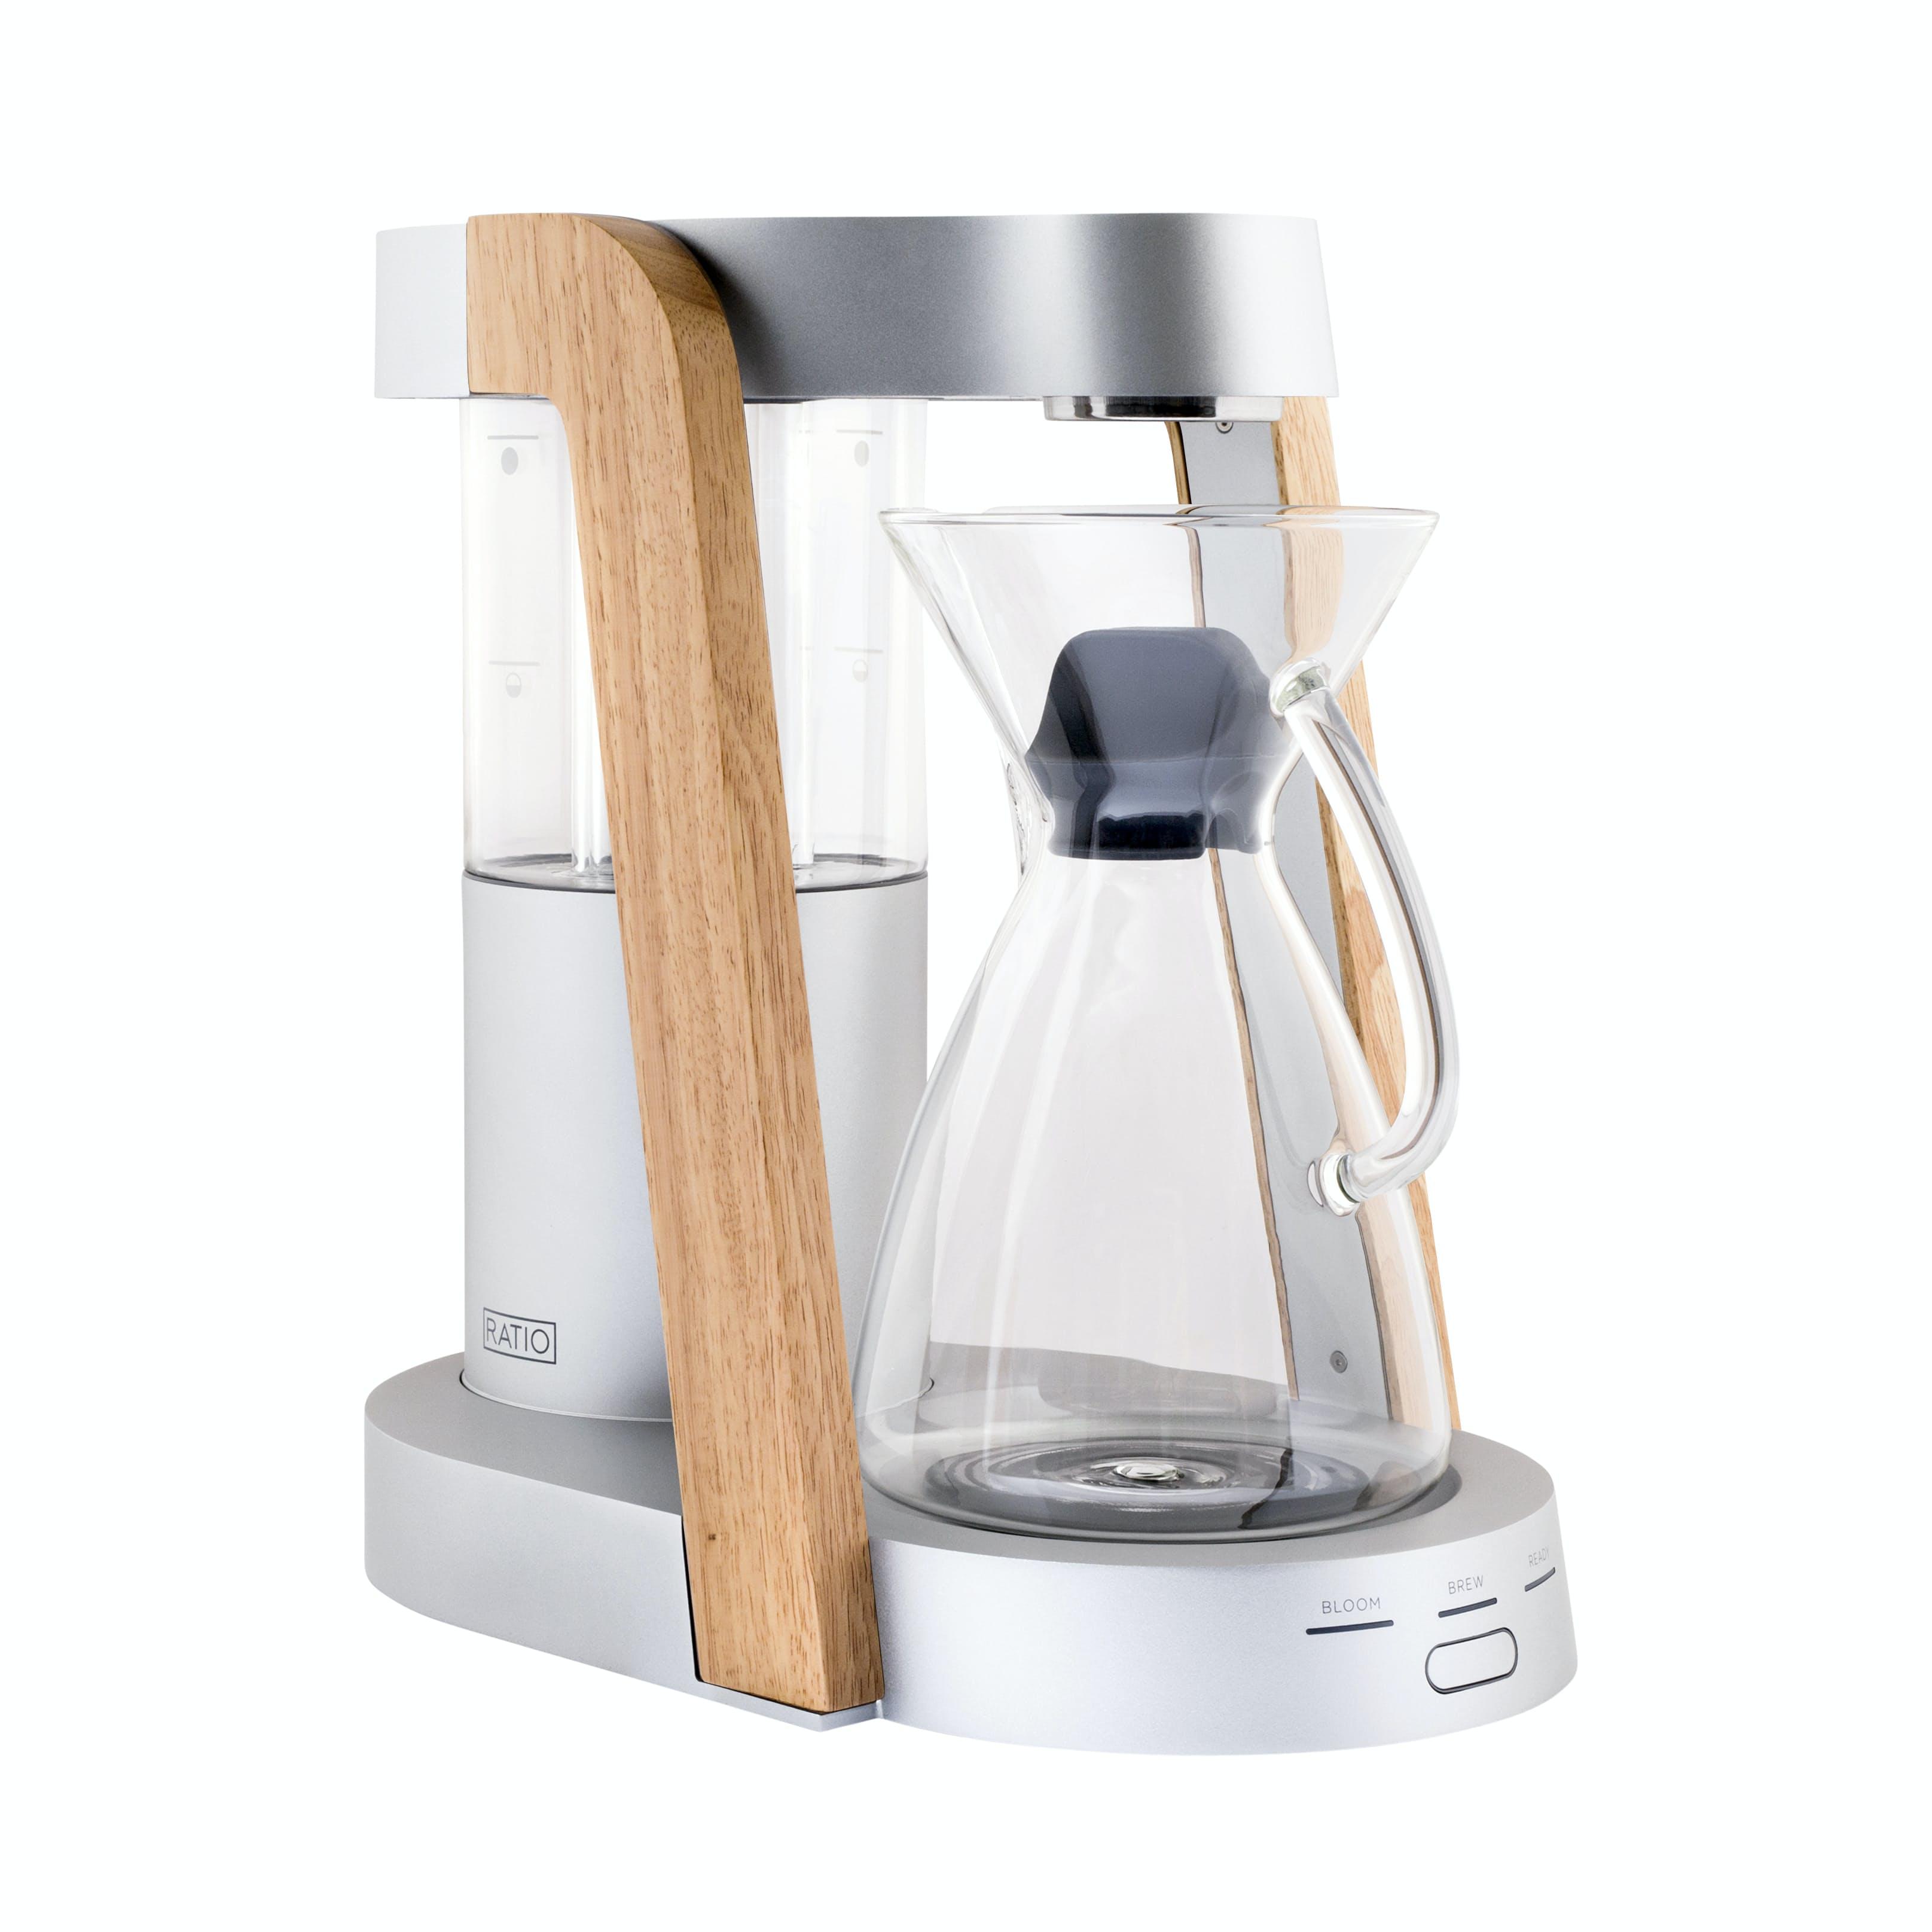 Wq2sxectzn ratio coffee ratio eight coffee maker 0 original